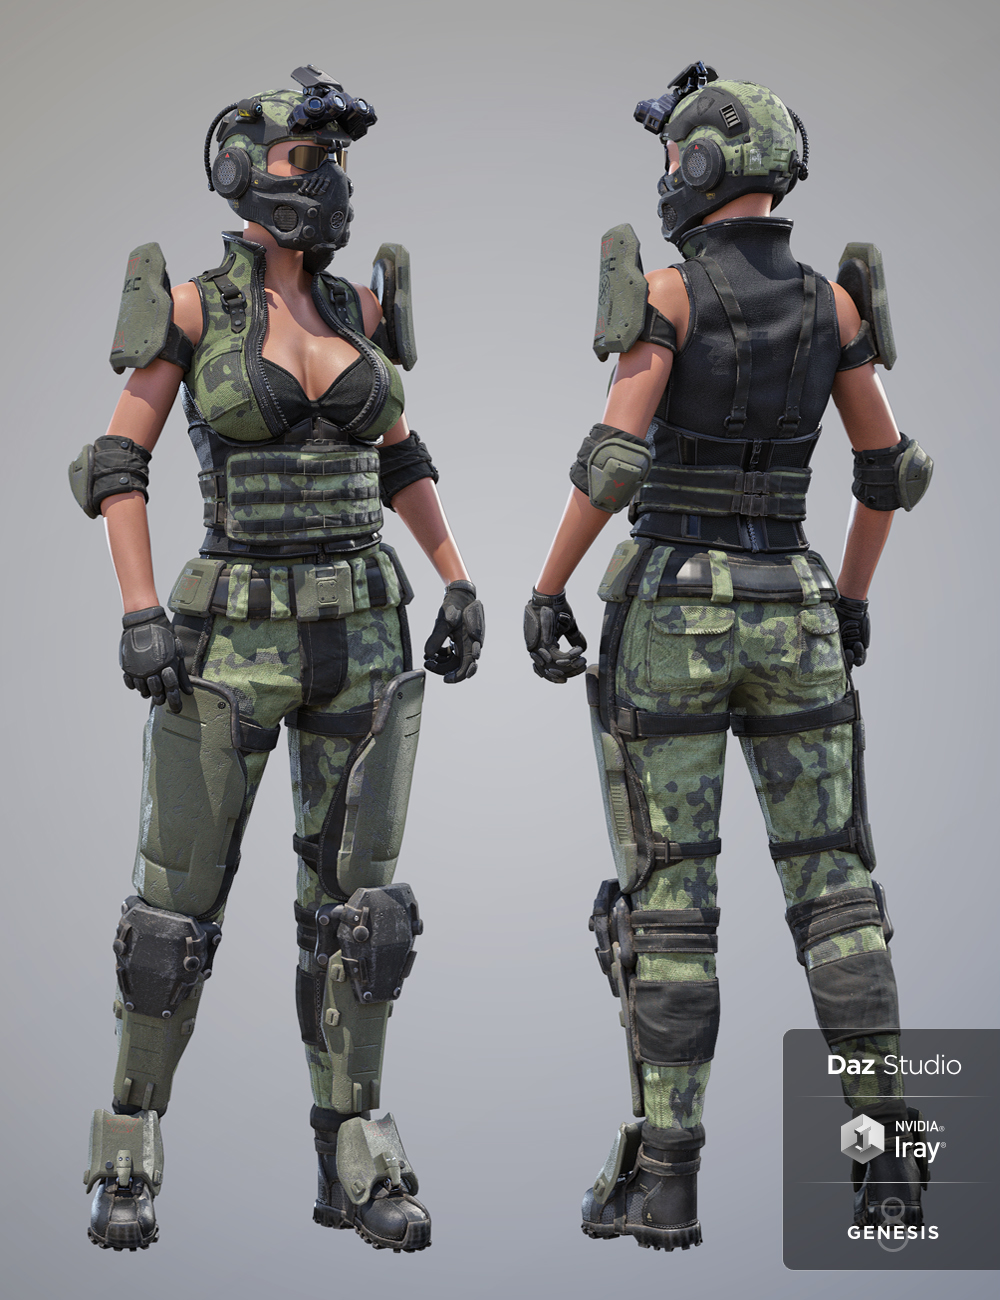 Tactical Assault Outfit Texture Expansion Pack by: Herschel Hoffmeyer, 3D Models by Daz 3D